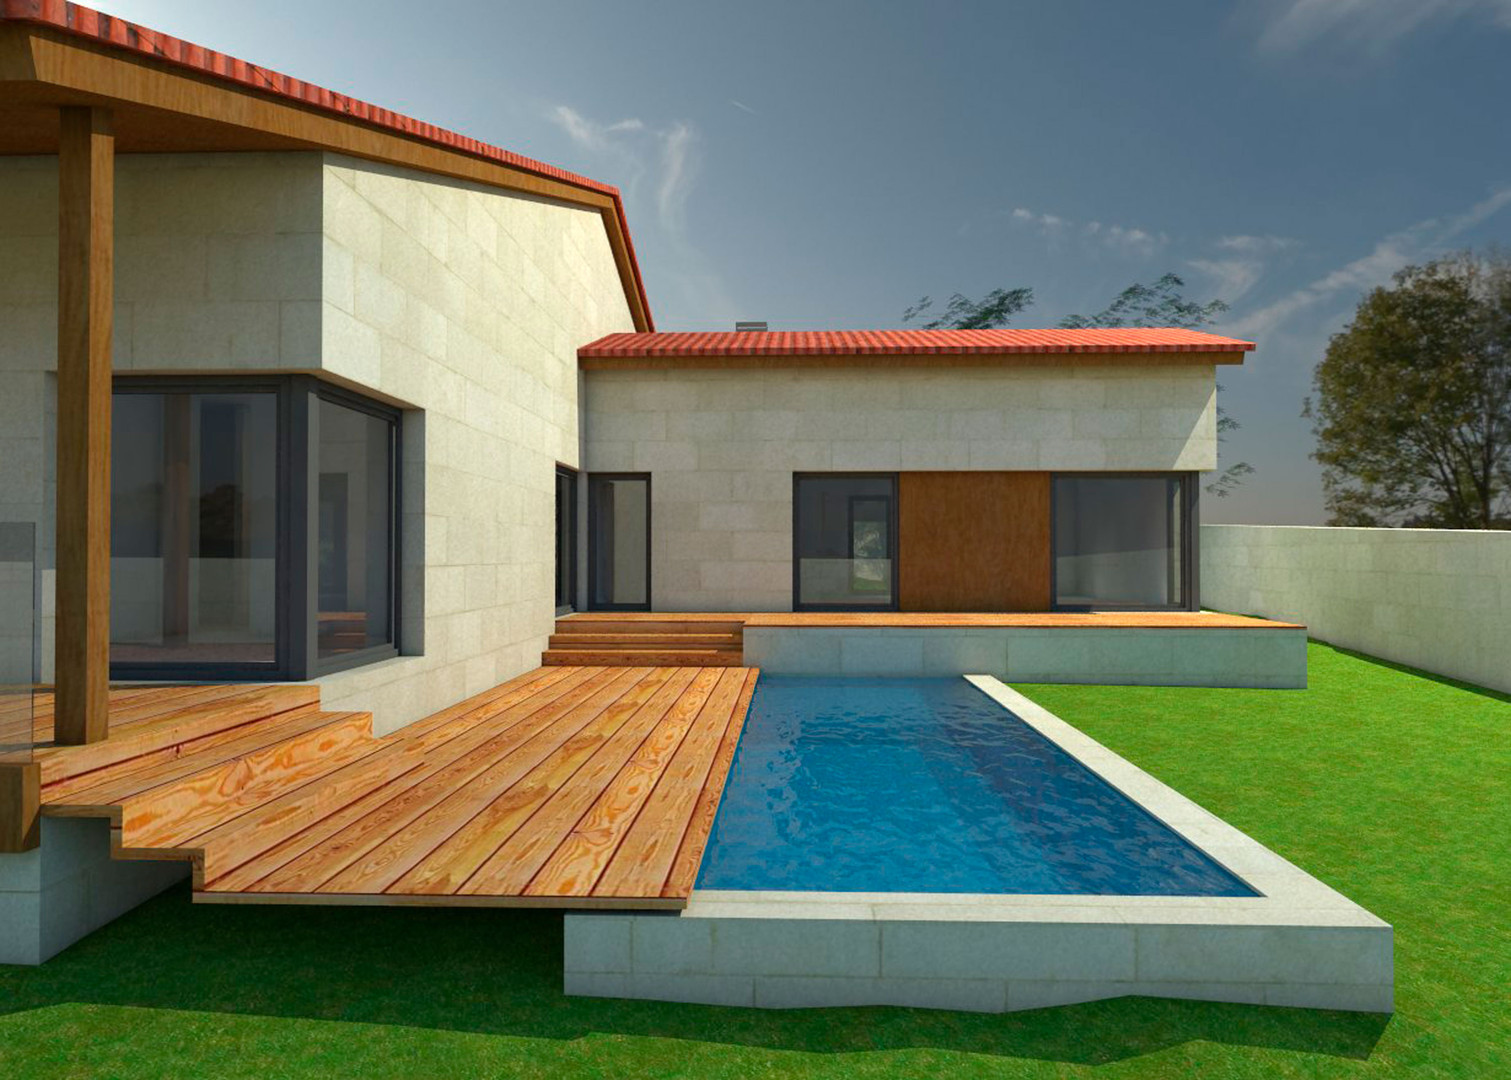 arquitectura-senmais-08.02.05.jpg